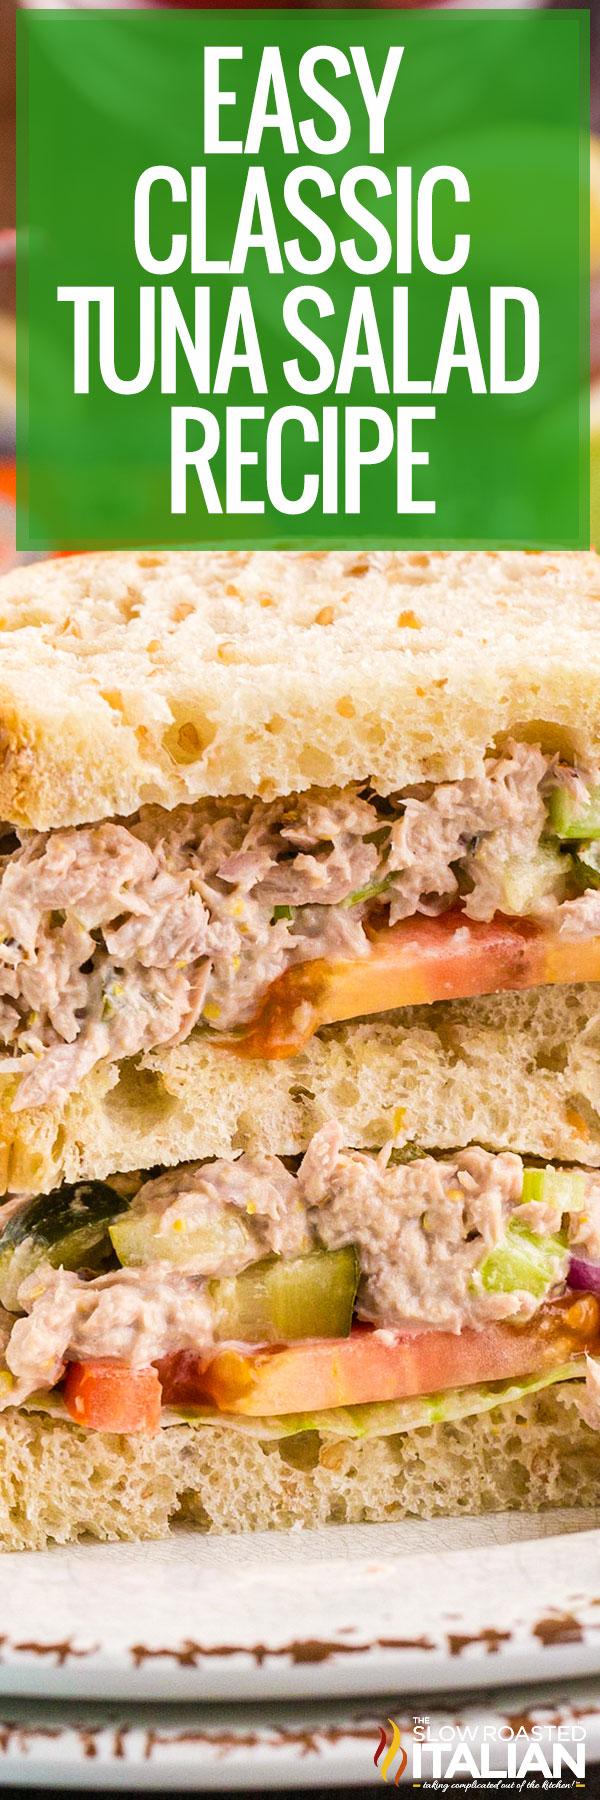 Tuna Salad Recipe close up